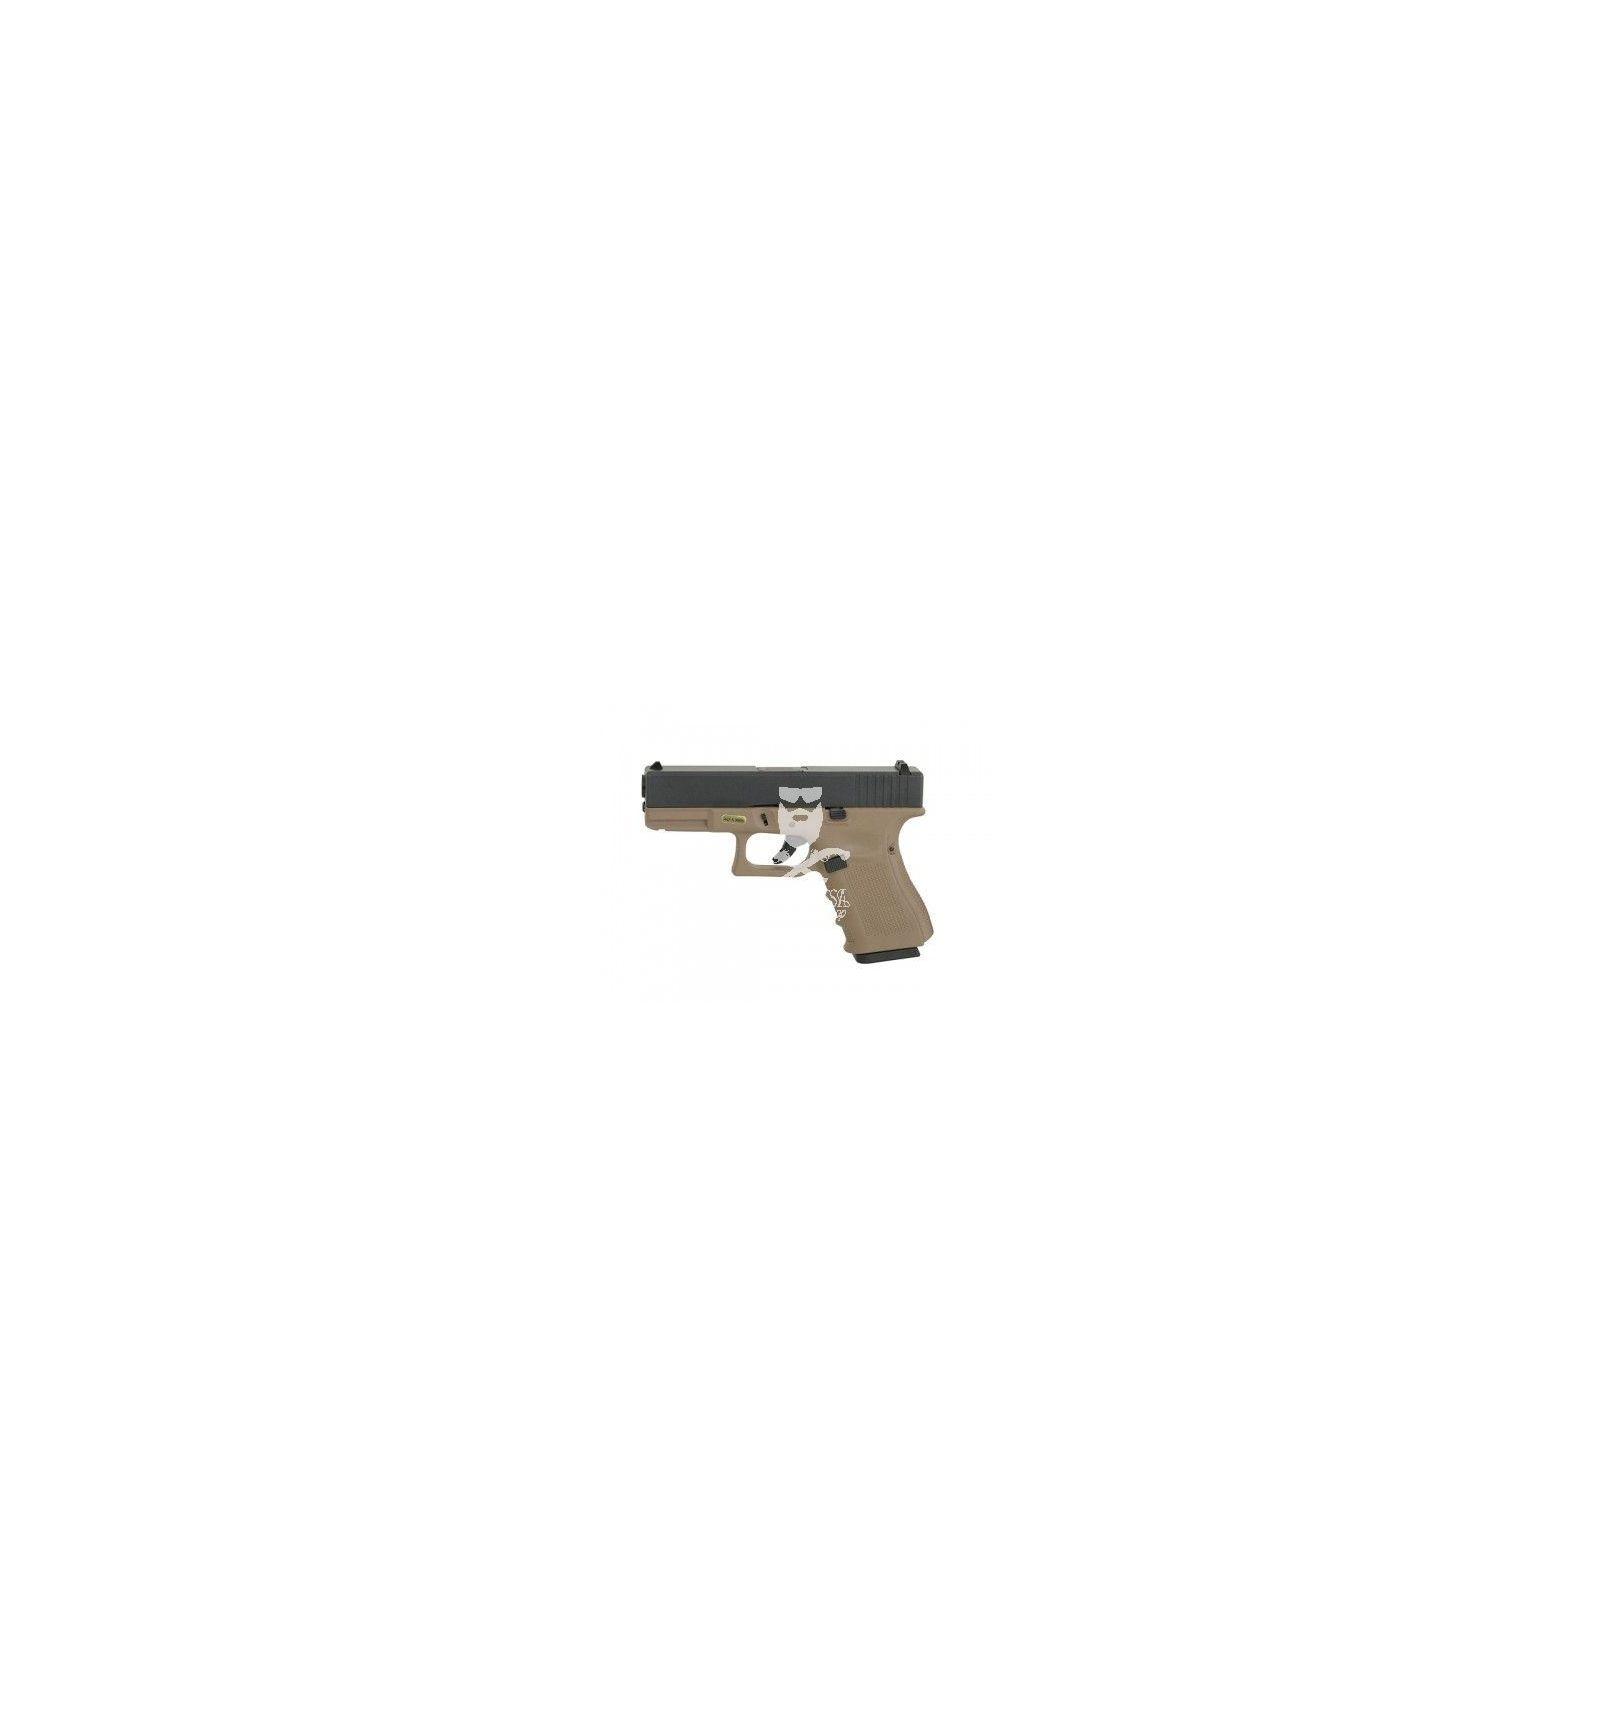 Glock 19 WE GBB tan gen.4